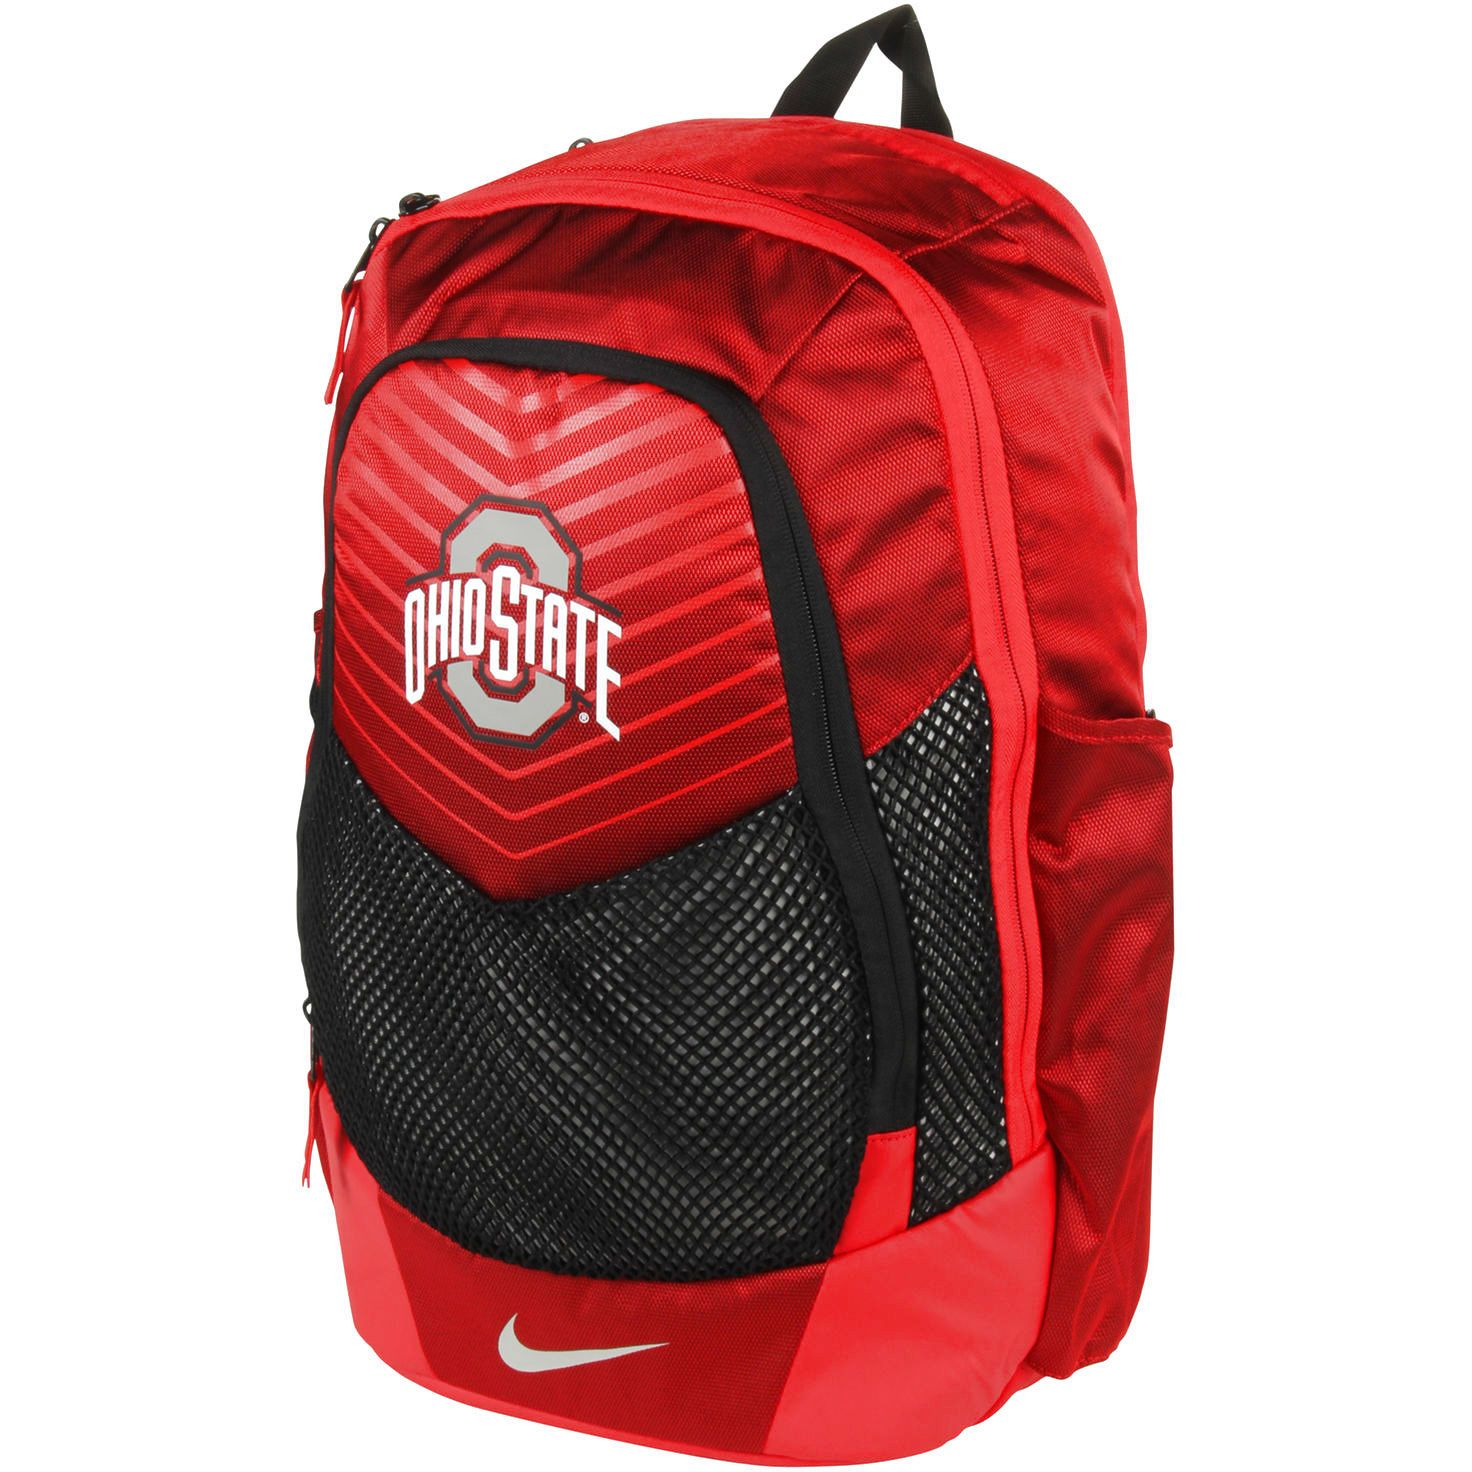 Ohio State Buckeyes Nike Vapor Power Backpack